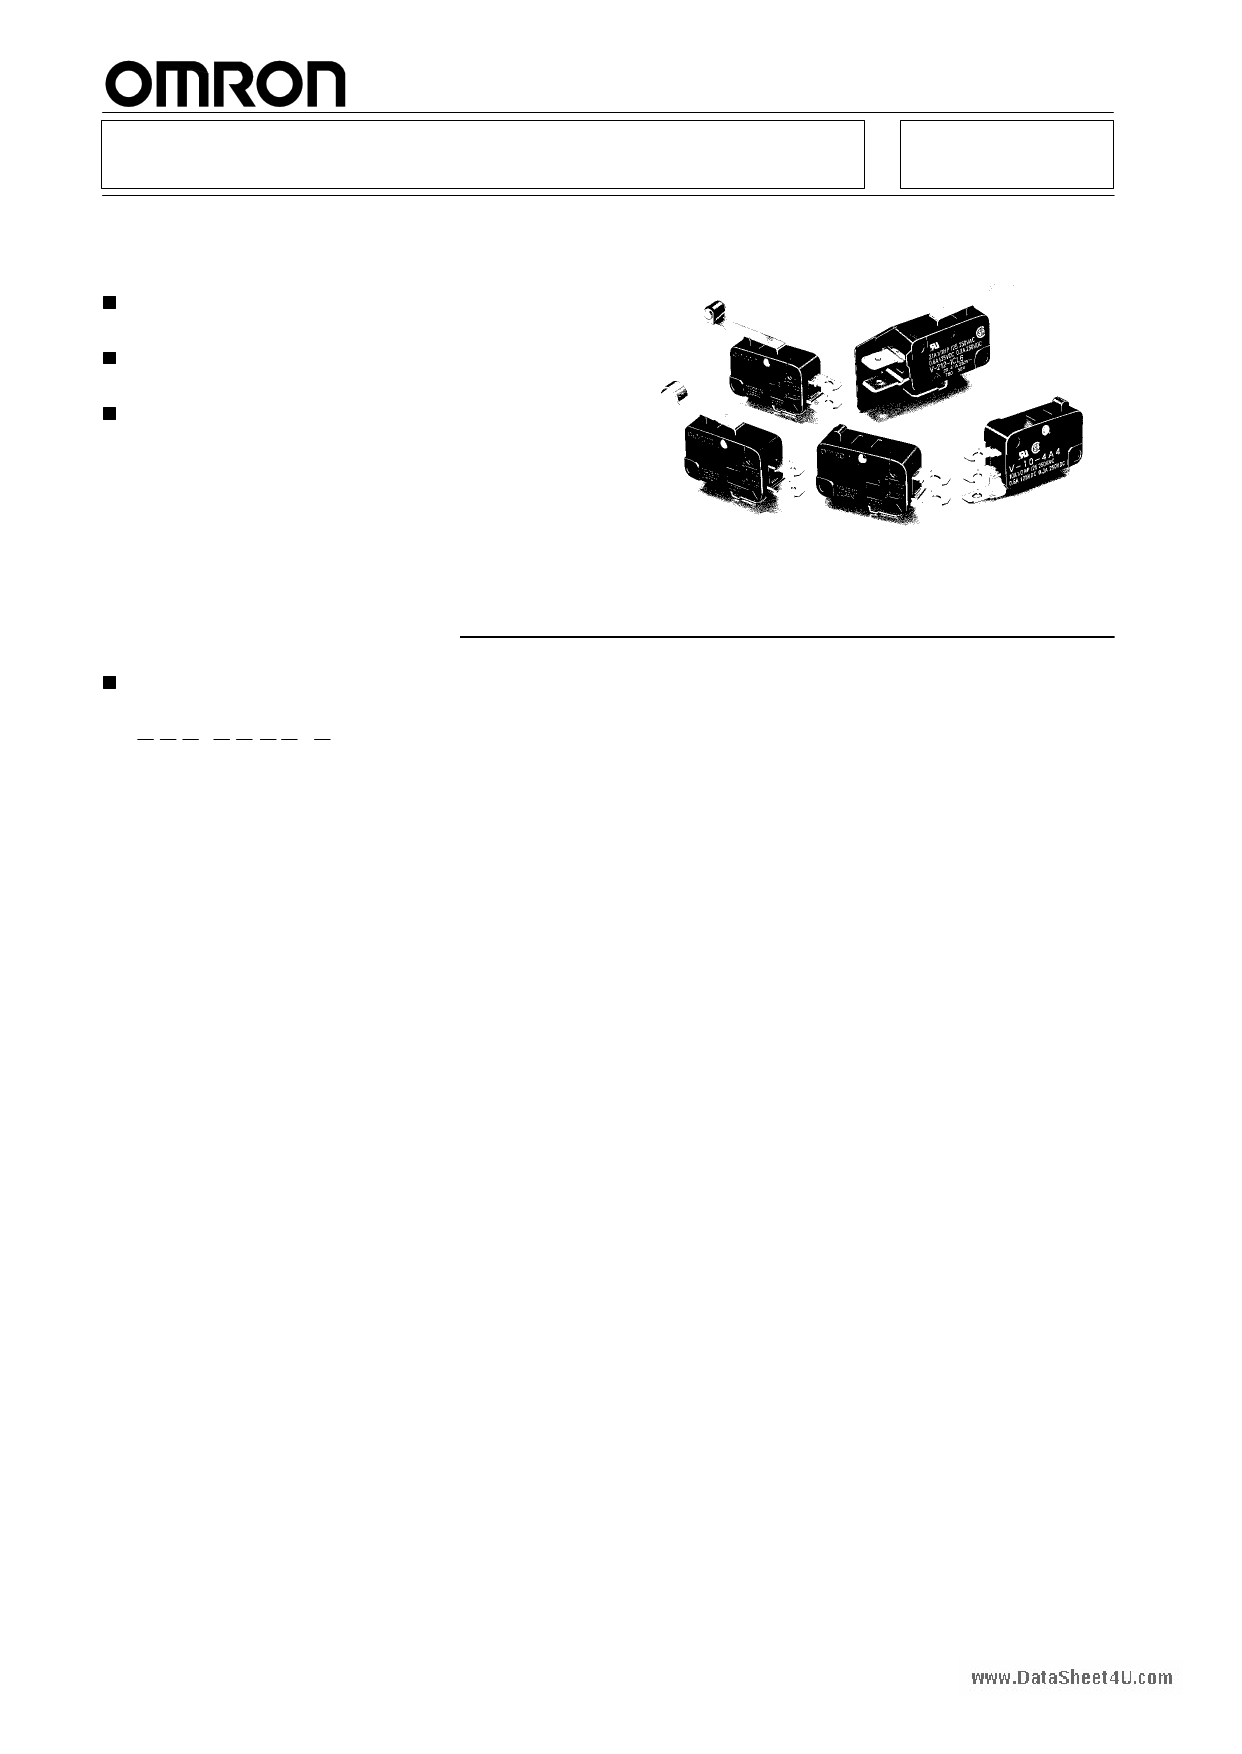 V-165-xxx Даташит, Описание, Даташиты